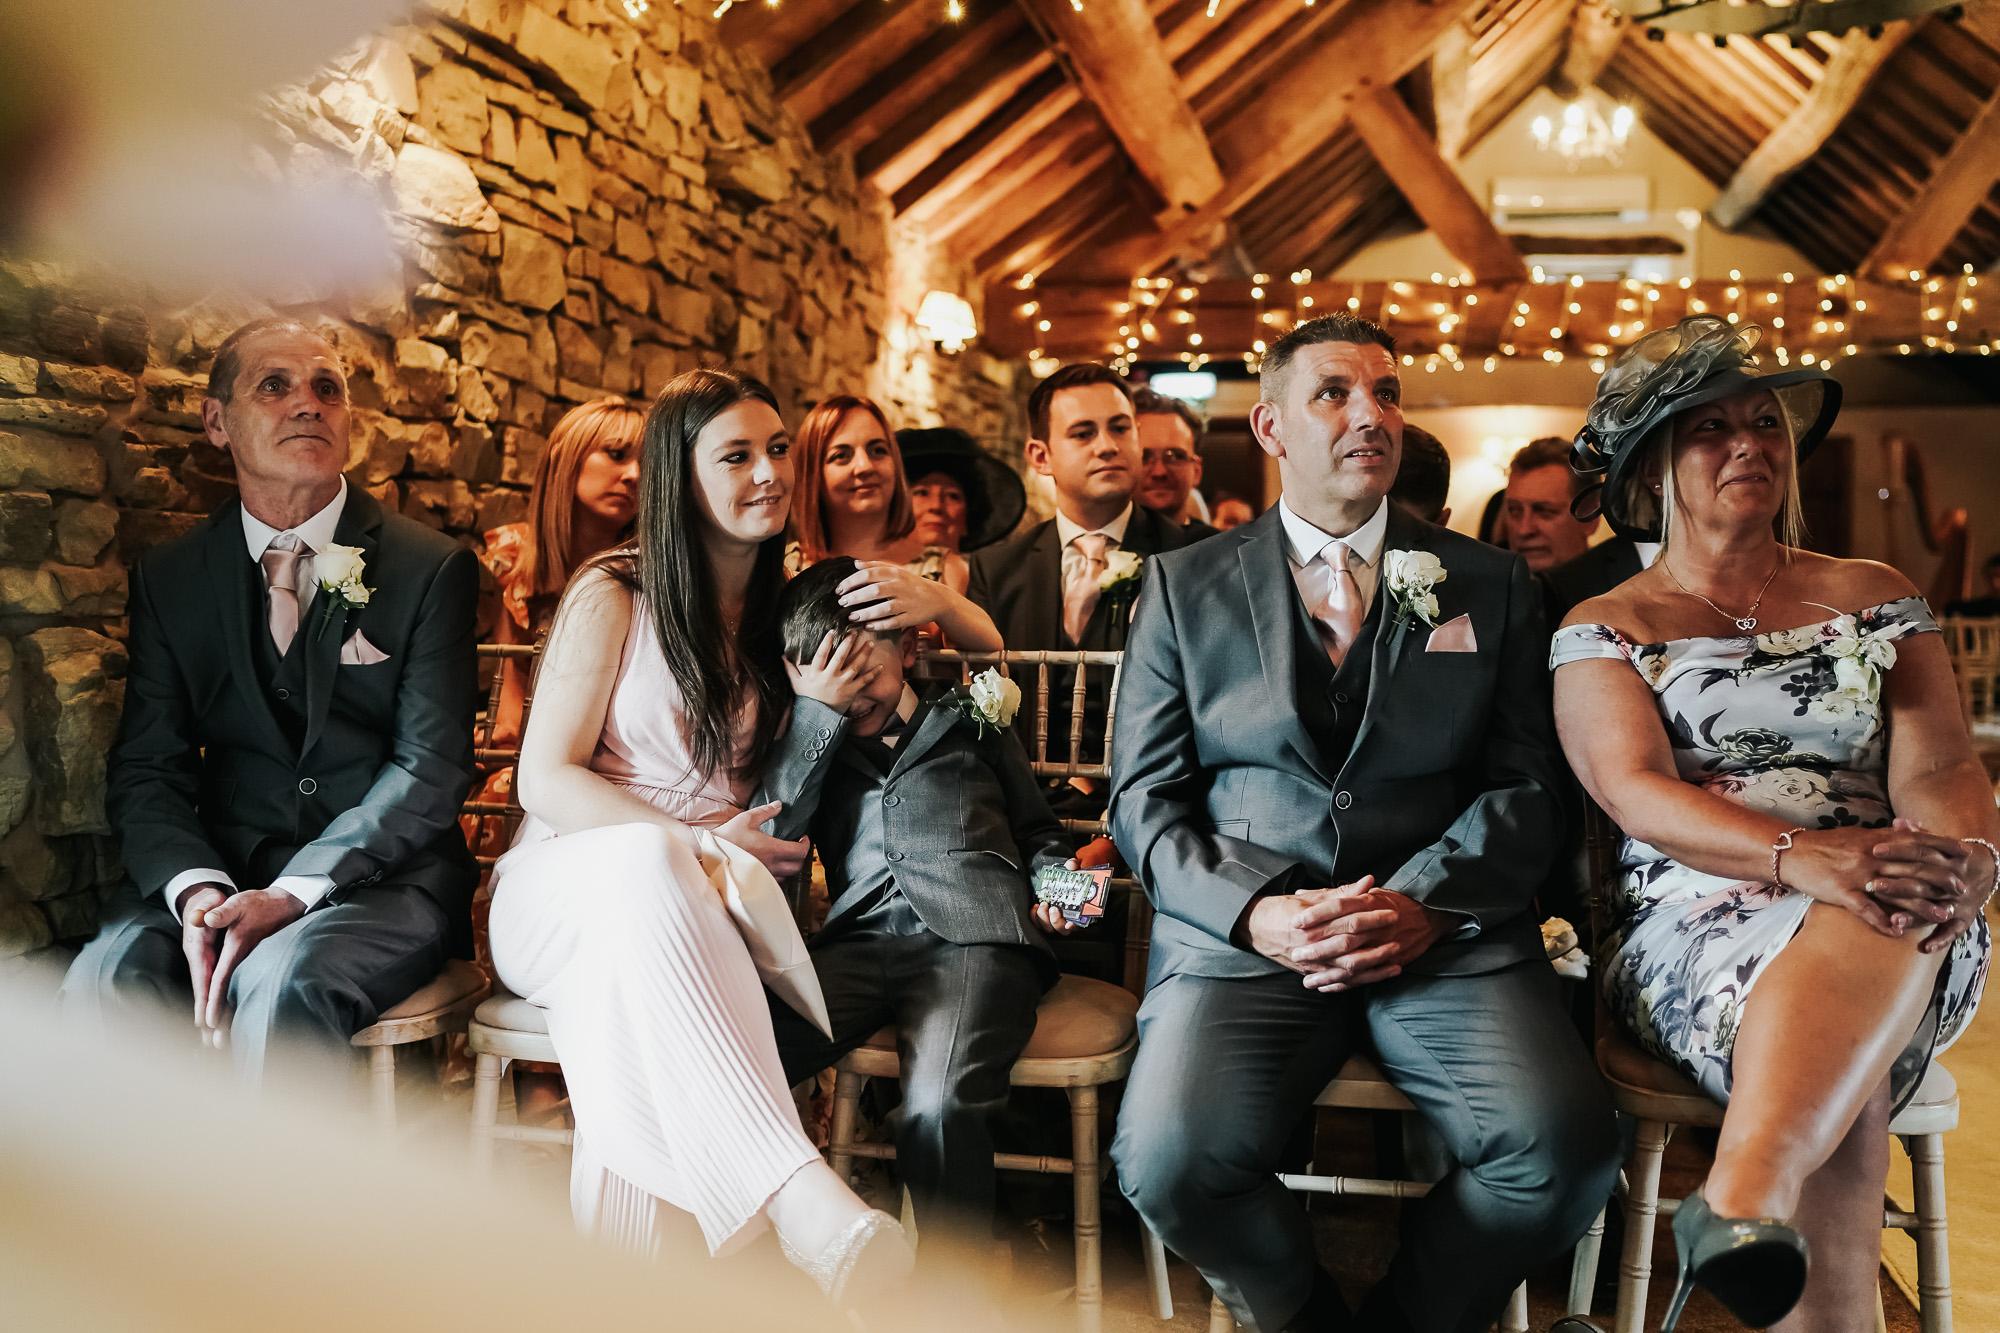 Hyde Bank Farm Wedding Photography Manchester wedding photographer (24 of 49).jpg